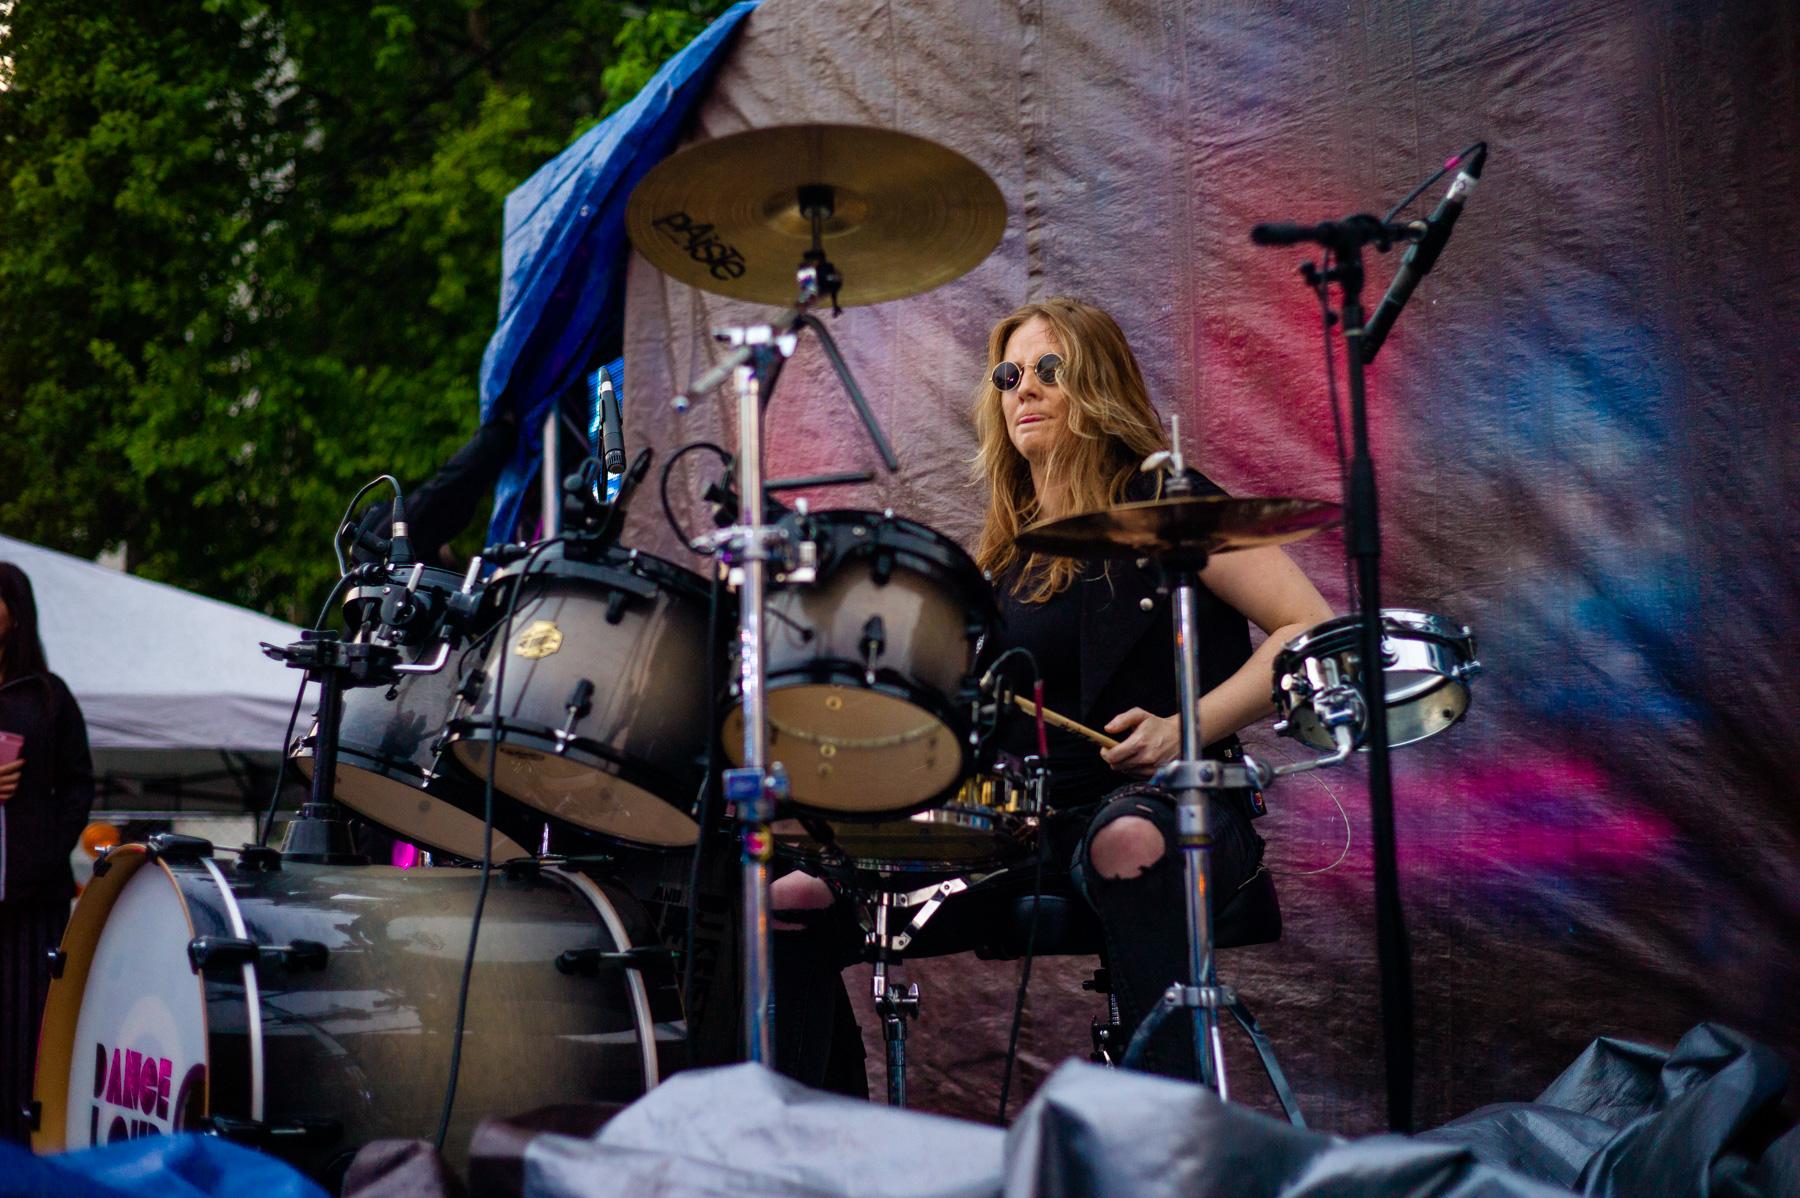 Badass girl drummer solo onstage